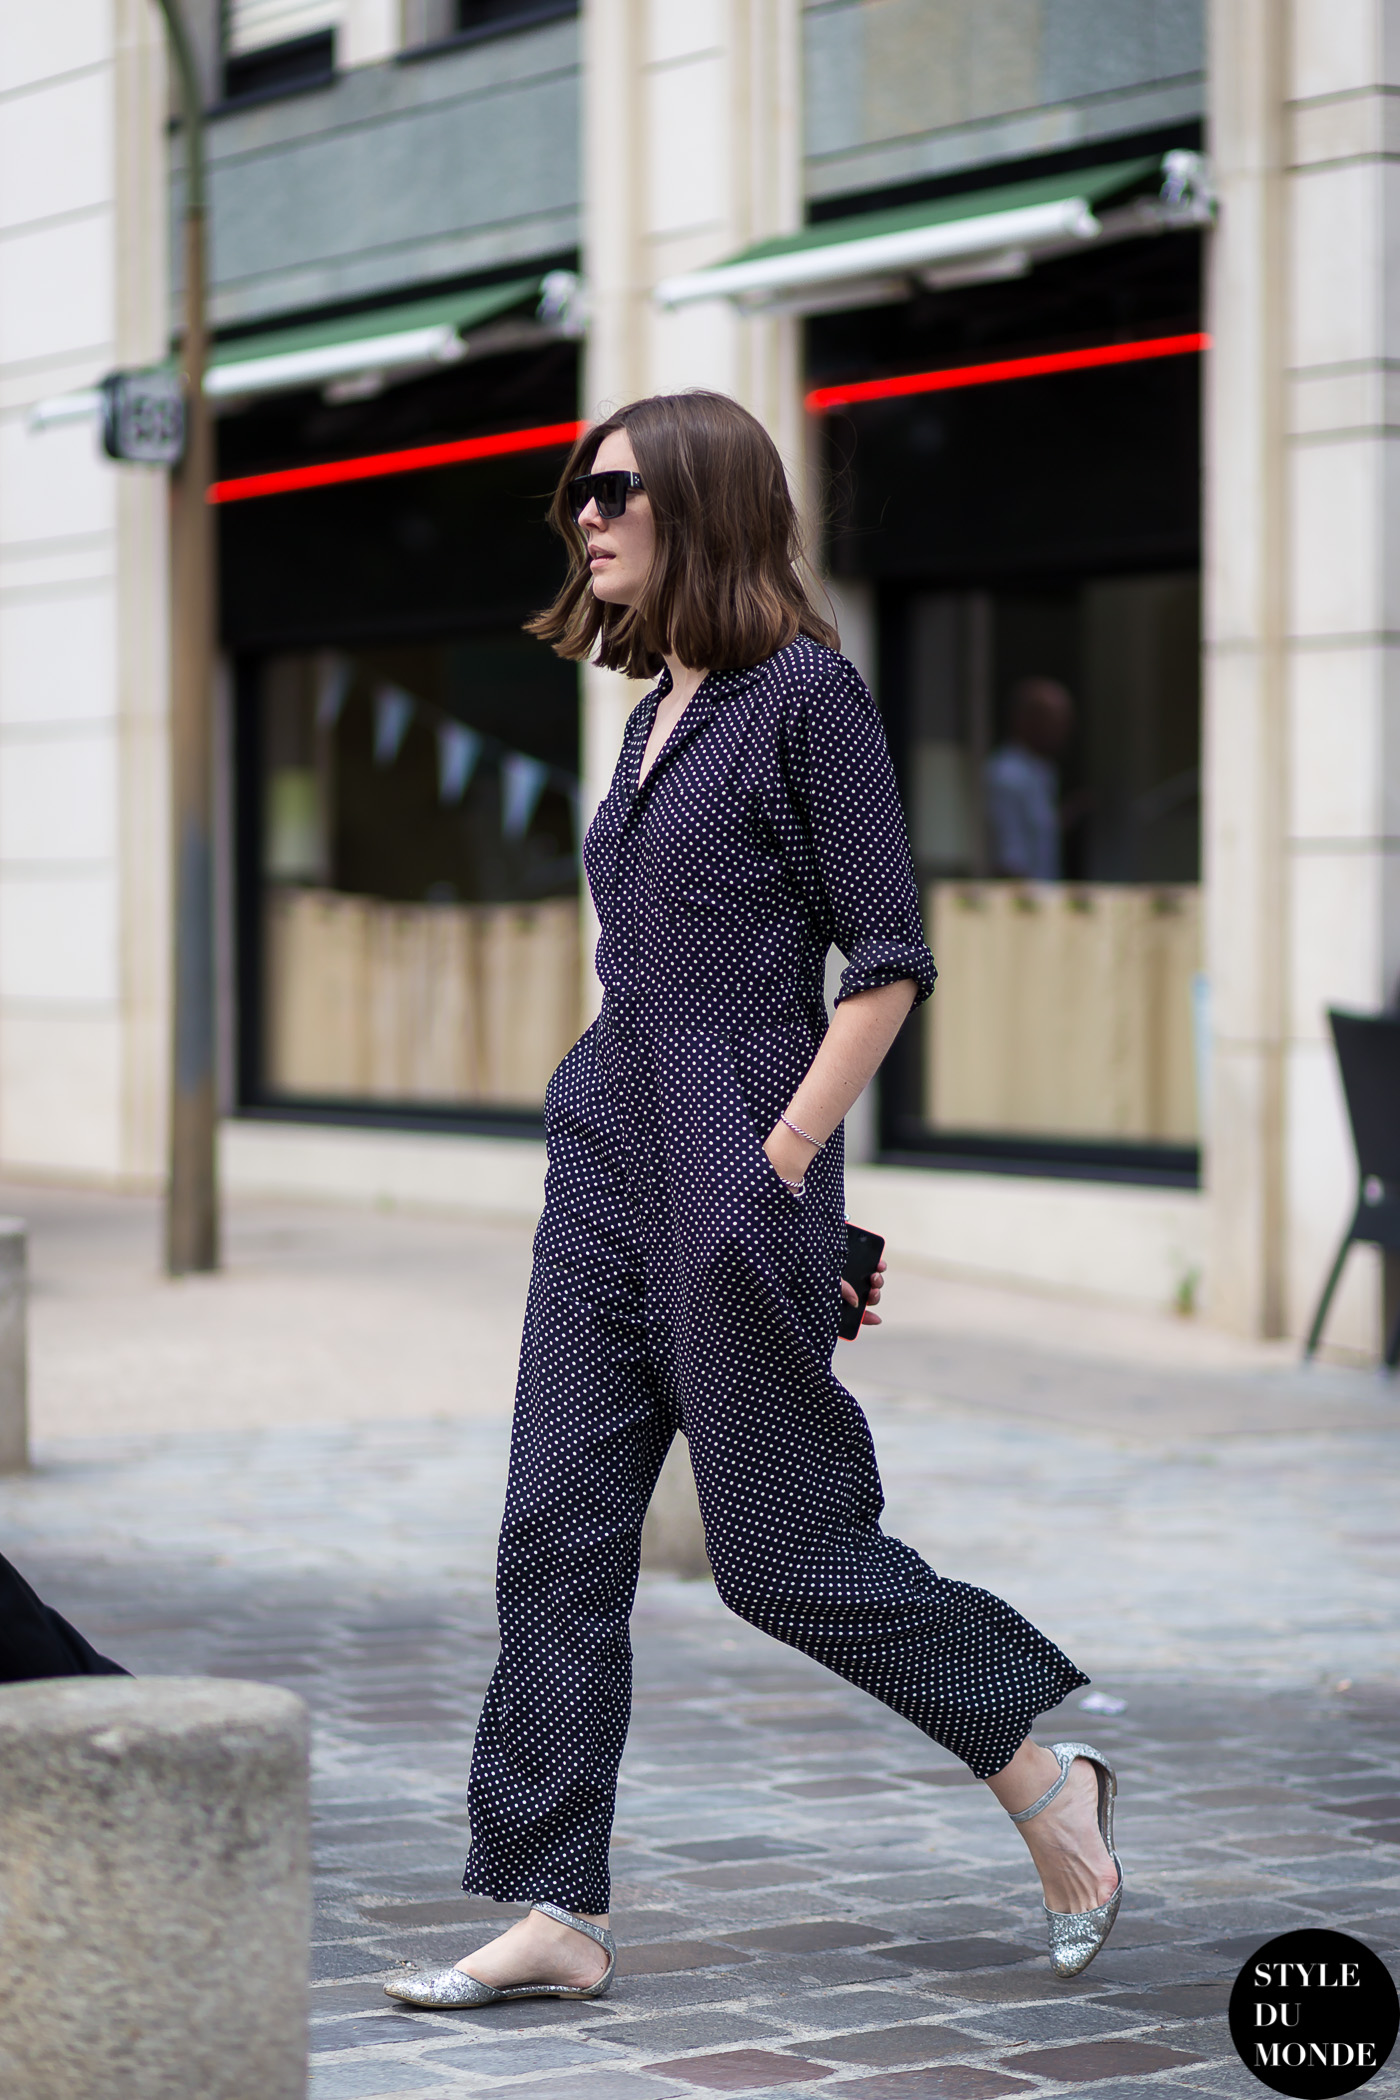 Polka Dot Jumpsuit Style Du Monde Street Style Street Fashion Photos